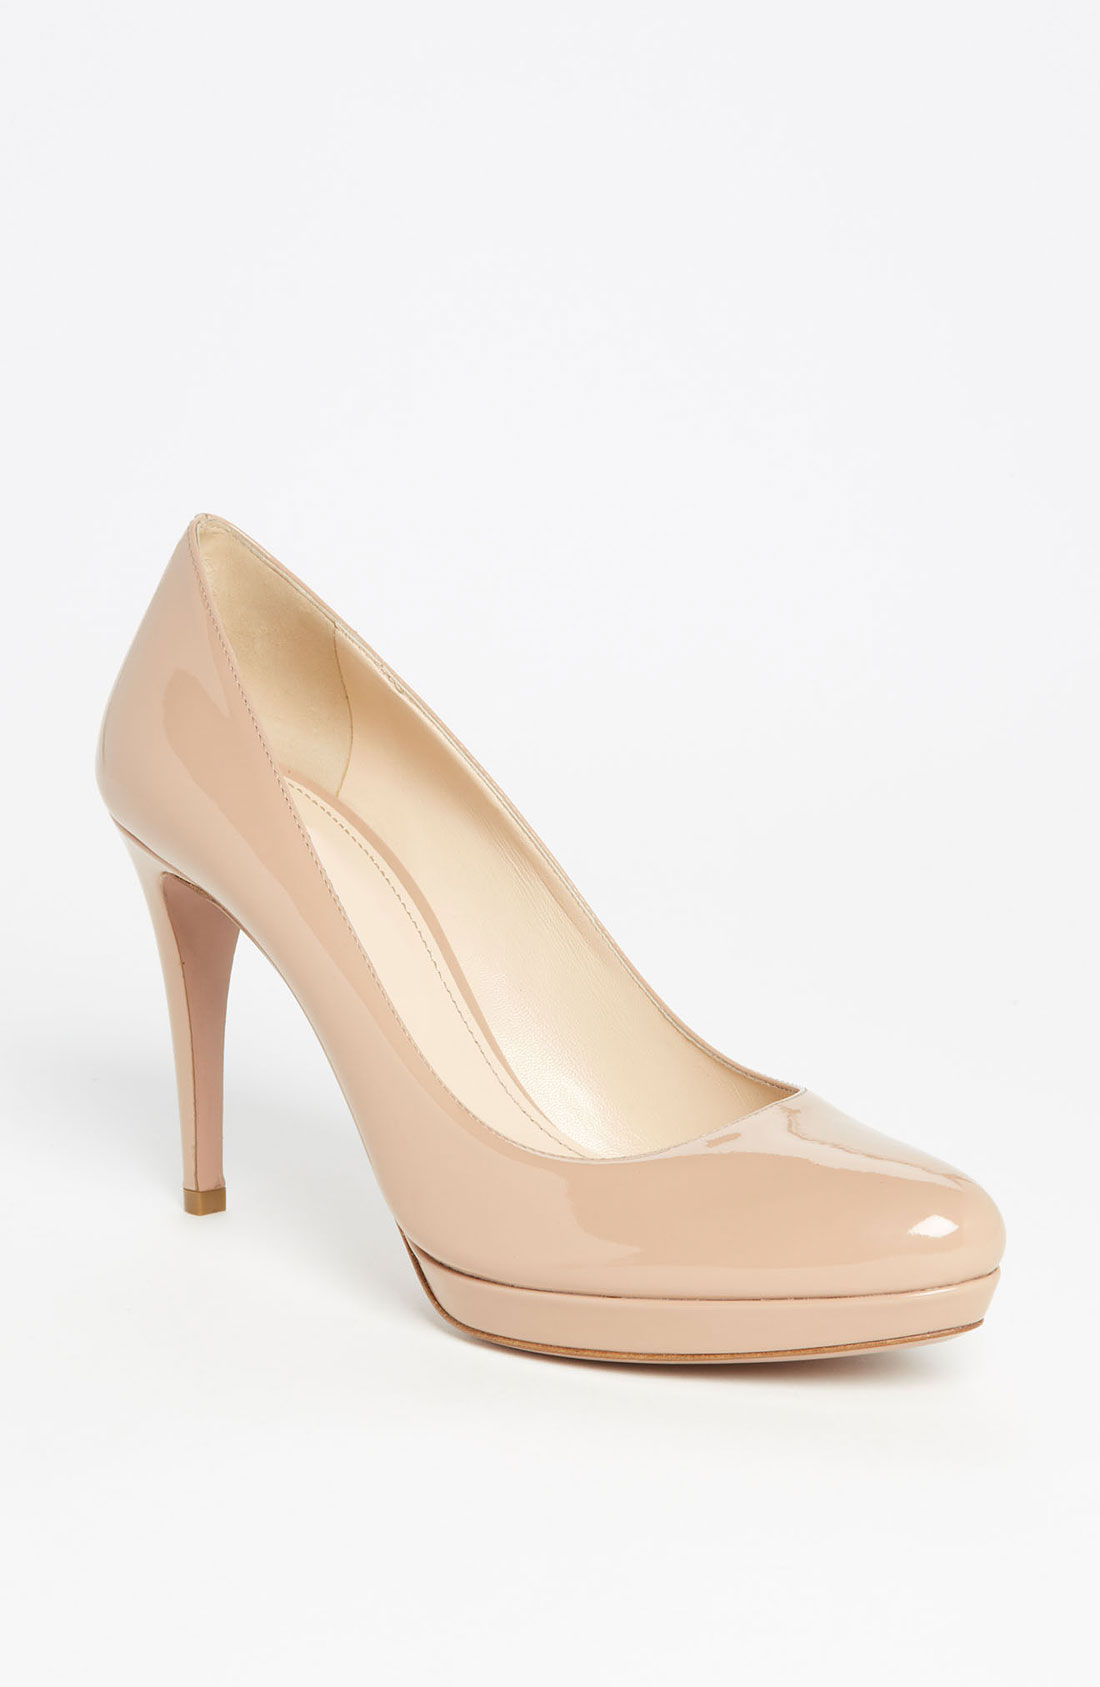 Kate Spade Sizing Shoes